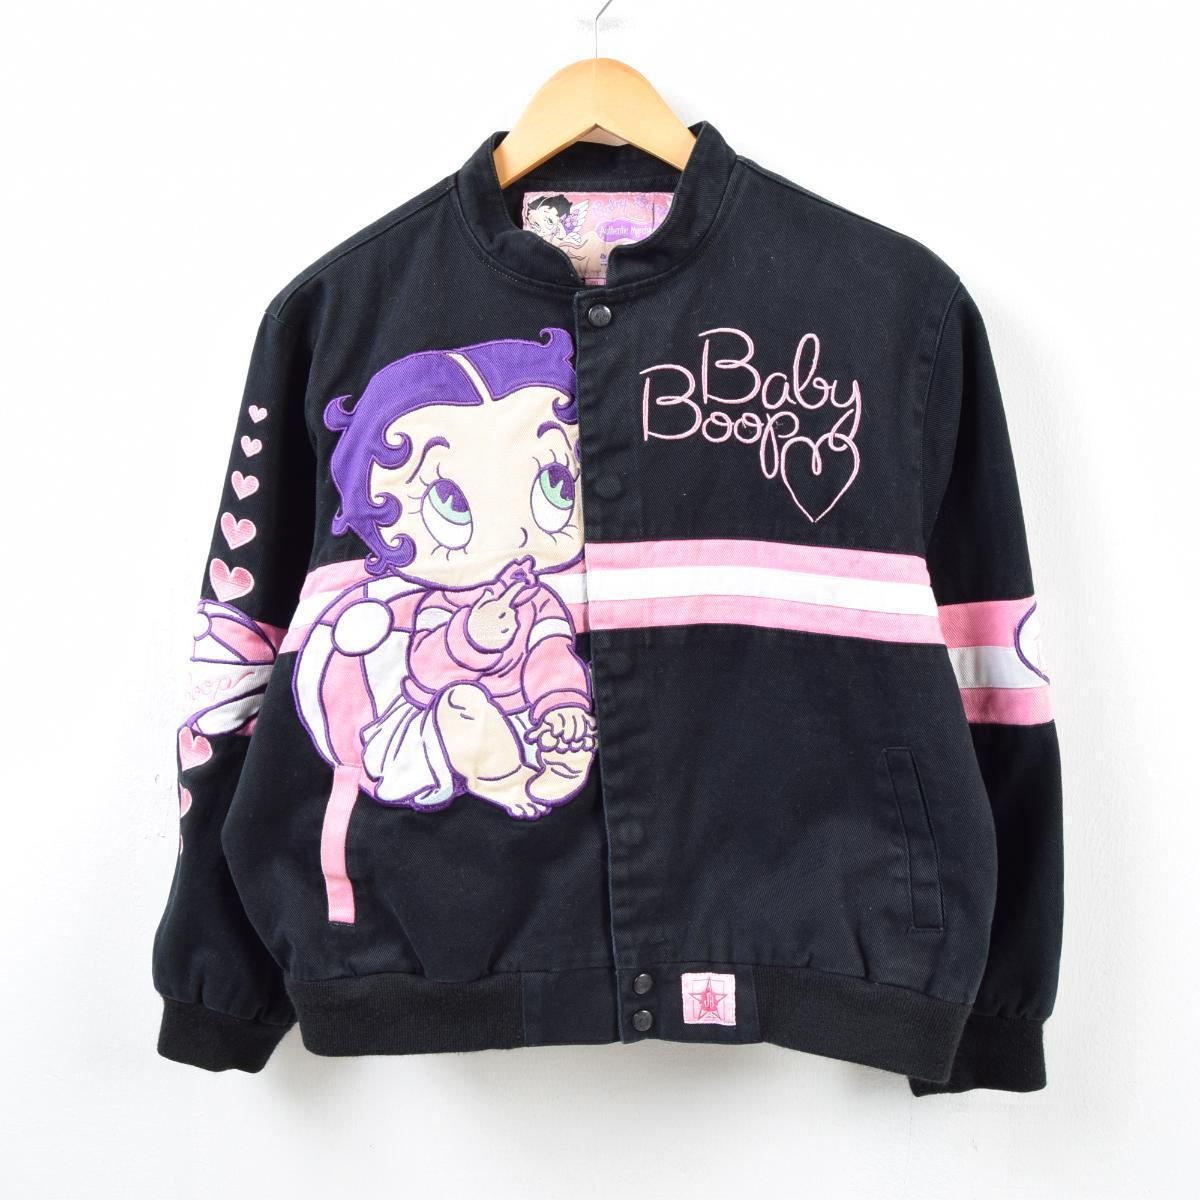 JH Design BABY BOOP ベビーブープ コットンジャケット レディースL /wba4301 【中古】 【190302】